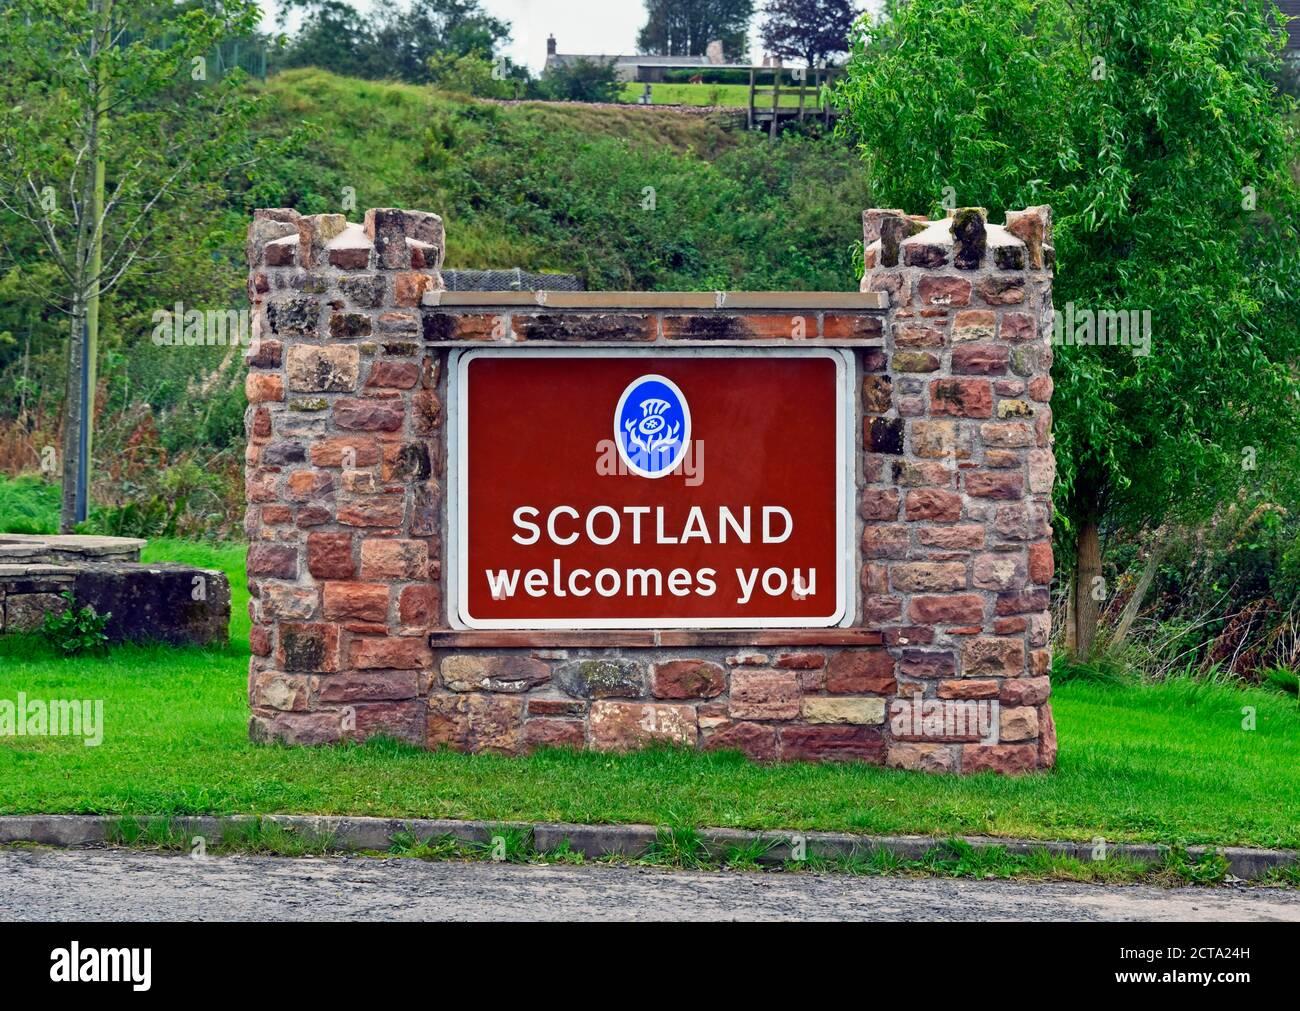 scotland-welcomes-you-sign-englandscotland-border-river-sark-springfield-gretna-dumfries-and-galloway-scotland-united-kingdom-europe-2CTA24H.jpg